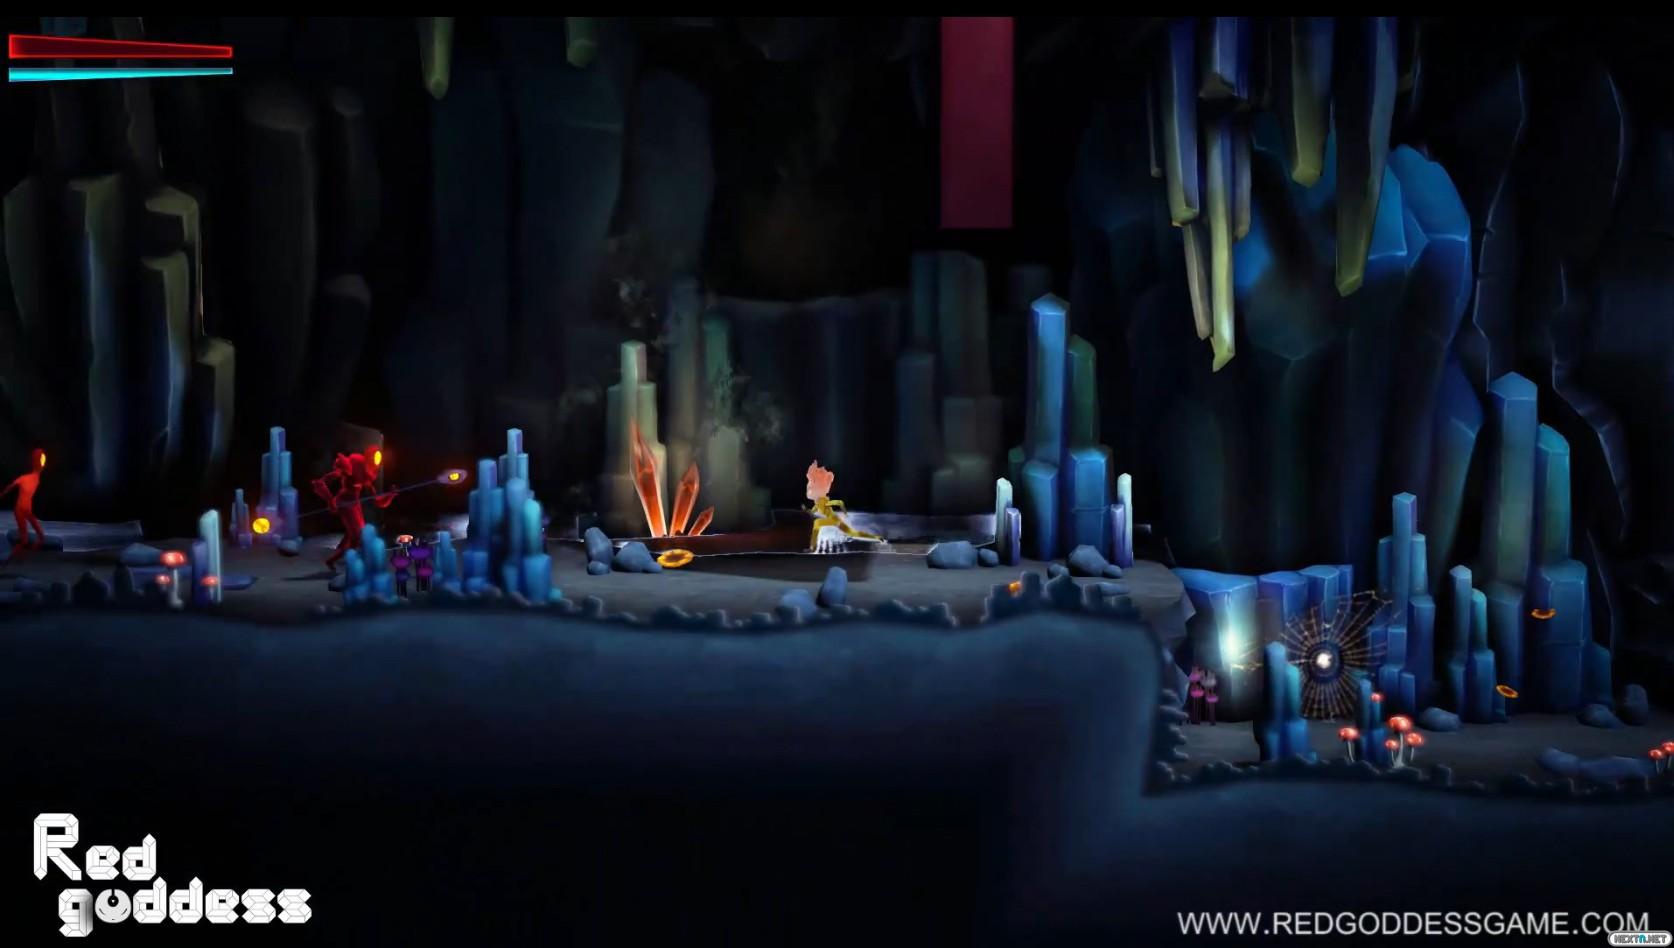 1503-14 Red Goddess Wii U 4